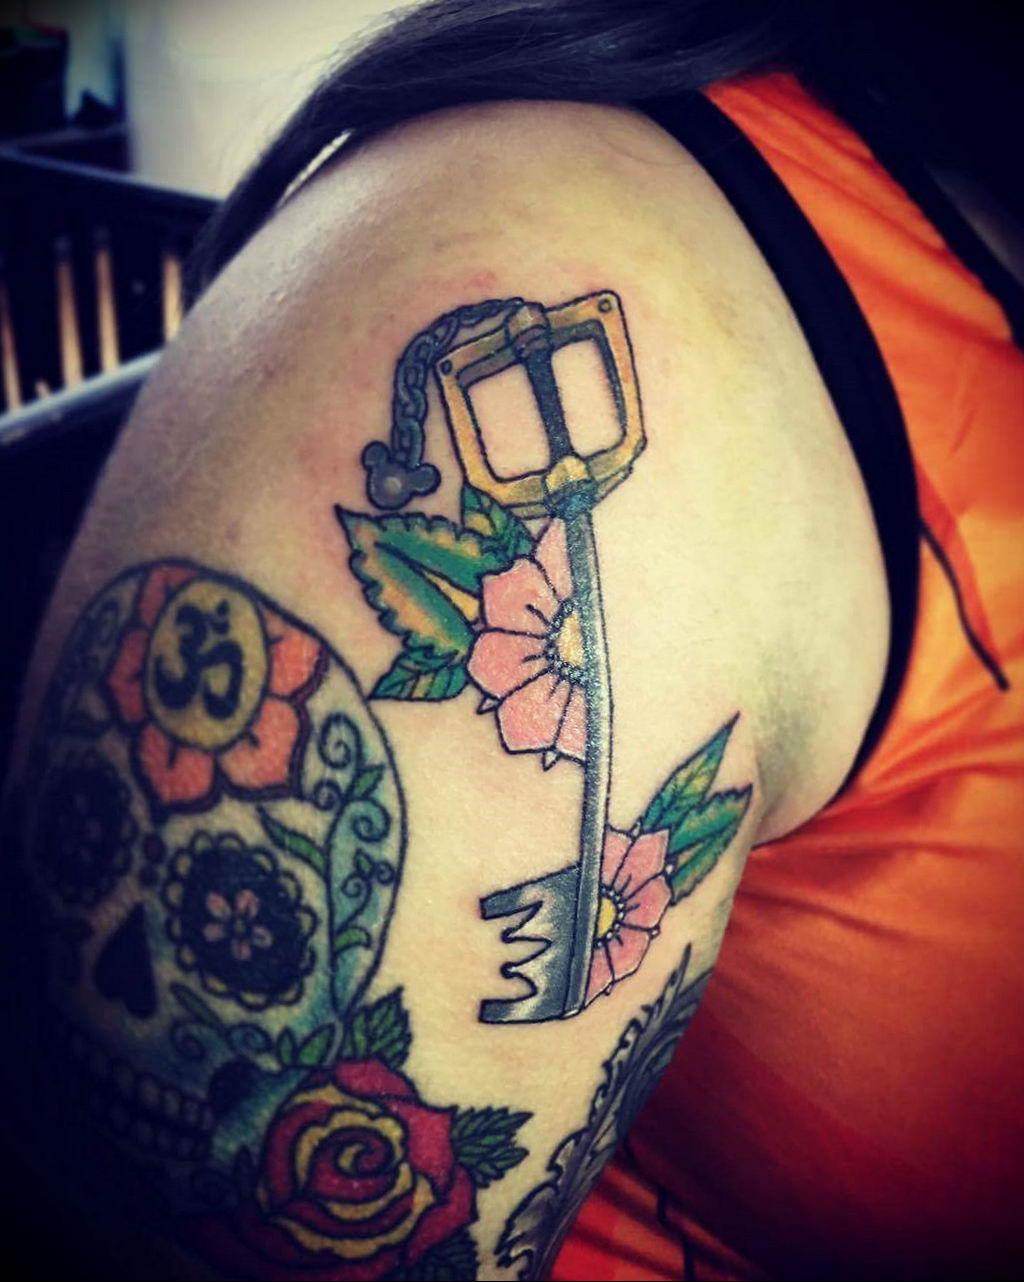 Фото тату для девушек ключ 21.08.2019 №032 - tattoo for girls key - tatufoto.com